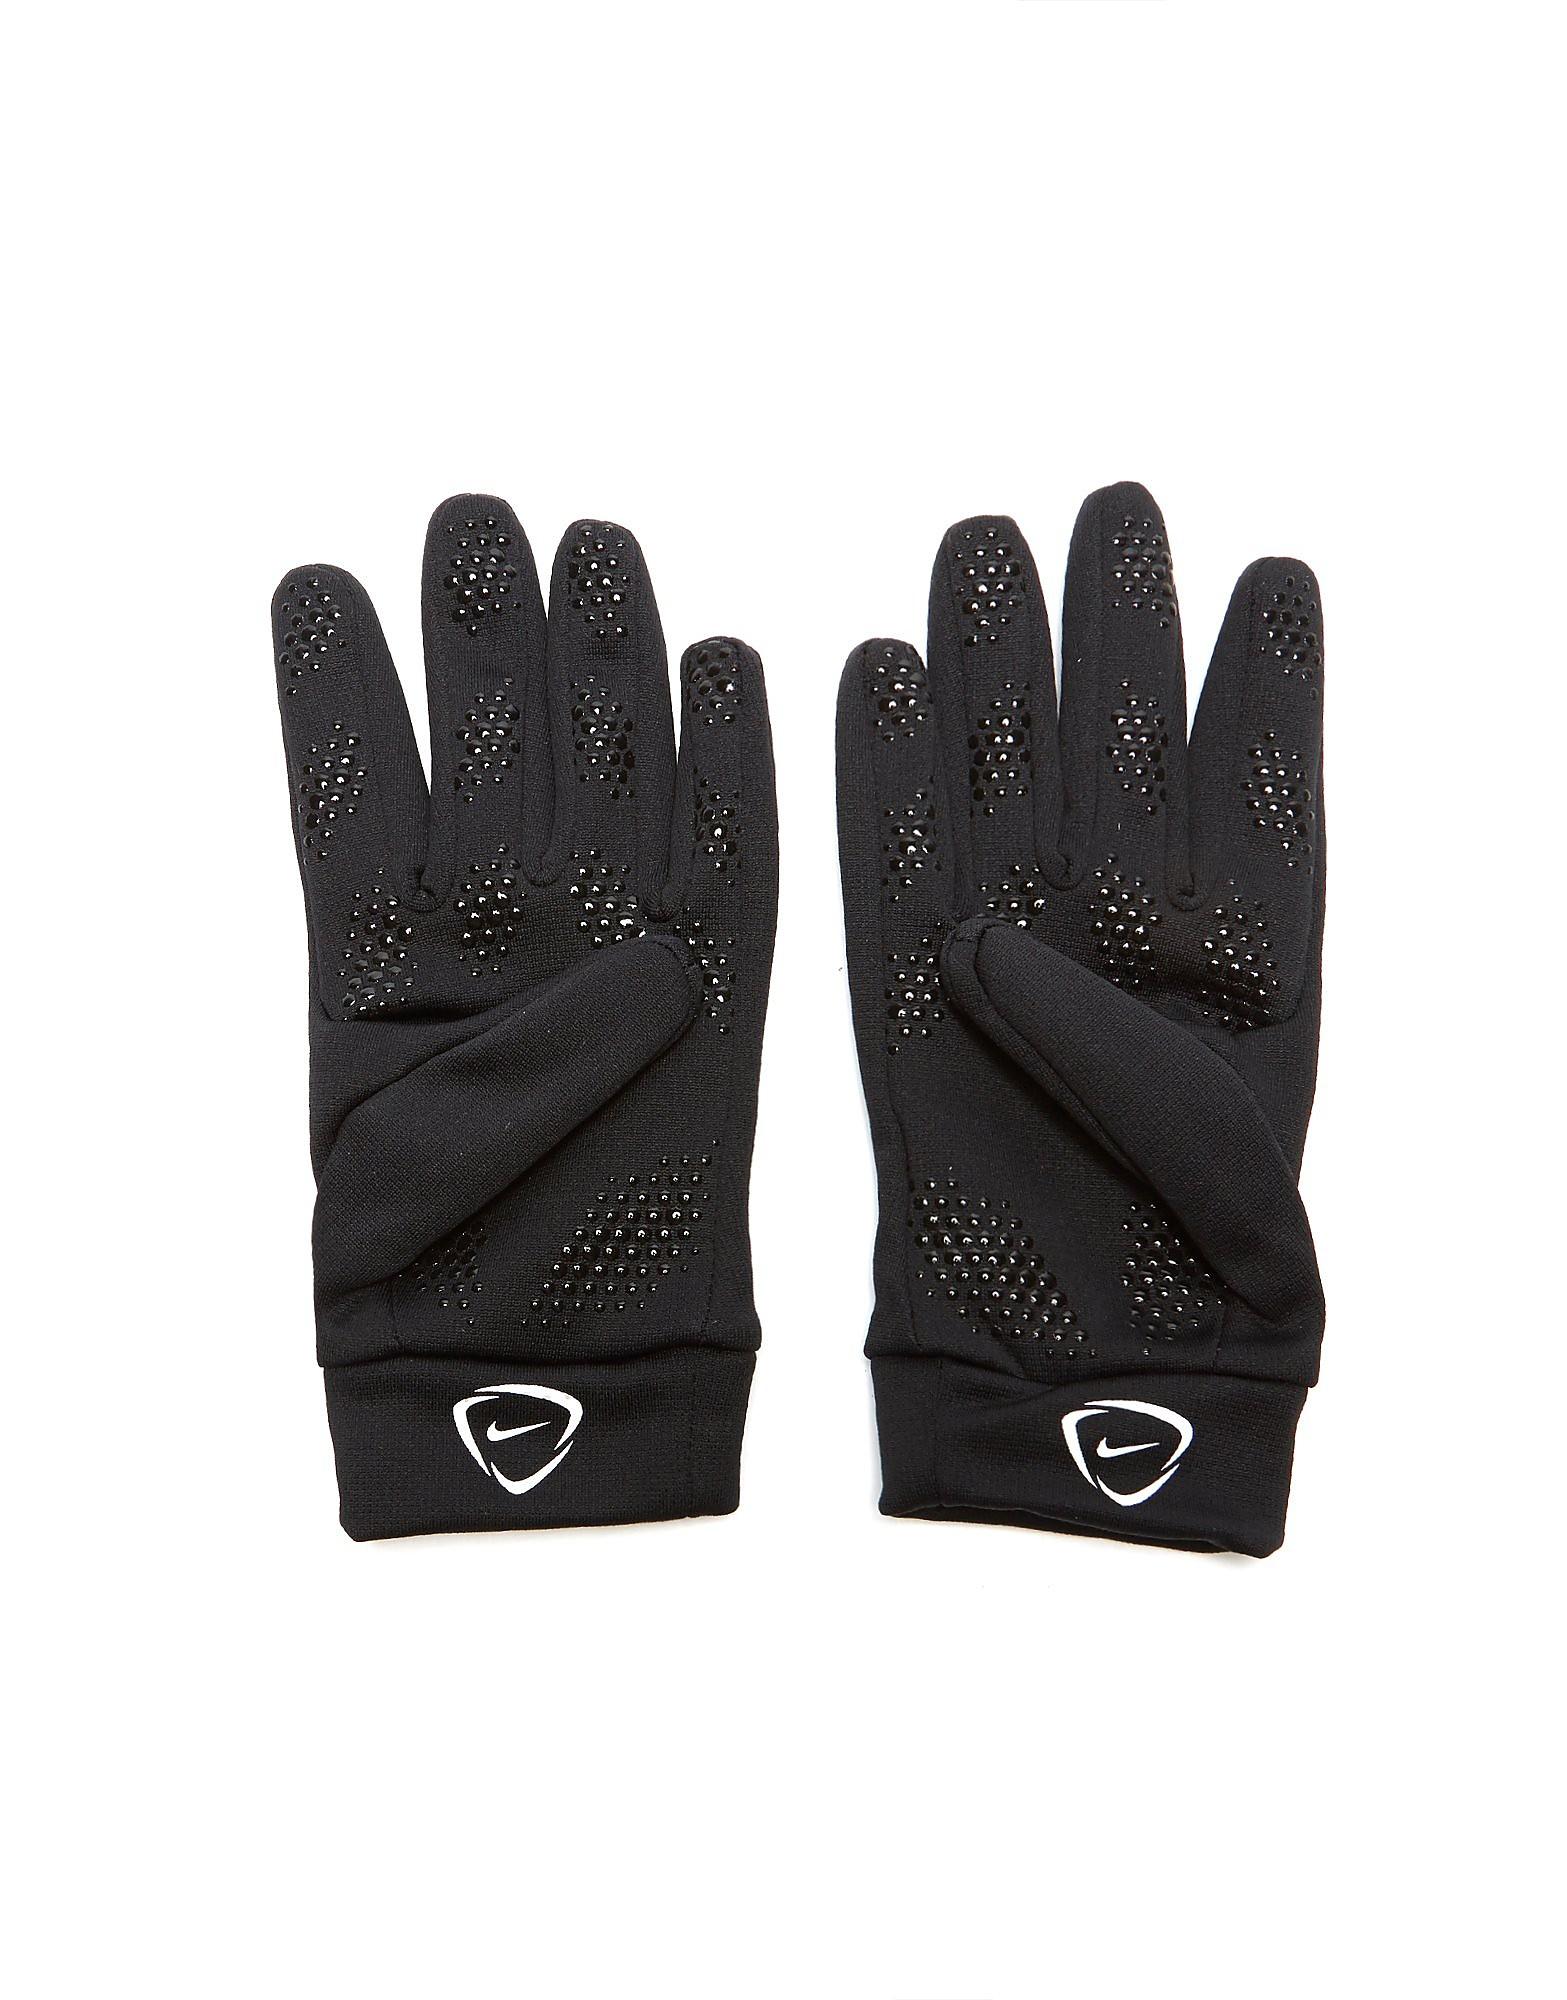 Nike Hyperwarm Field Player Gloves Junior